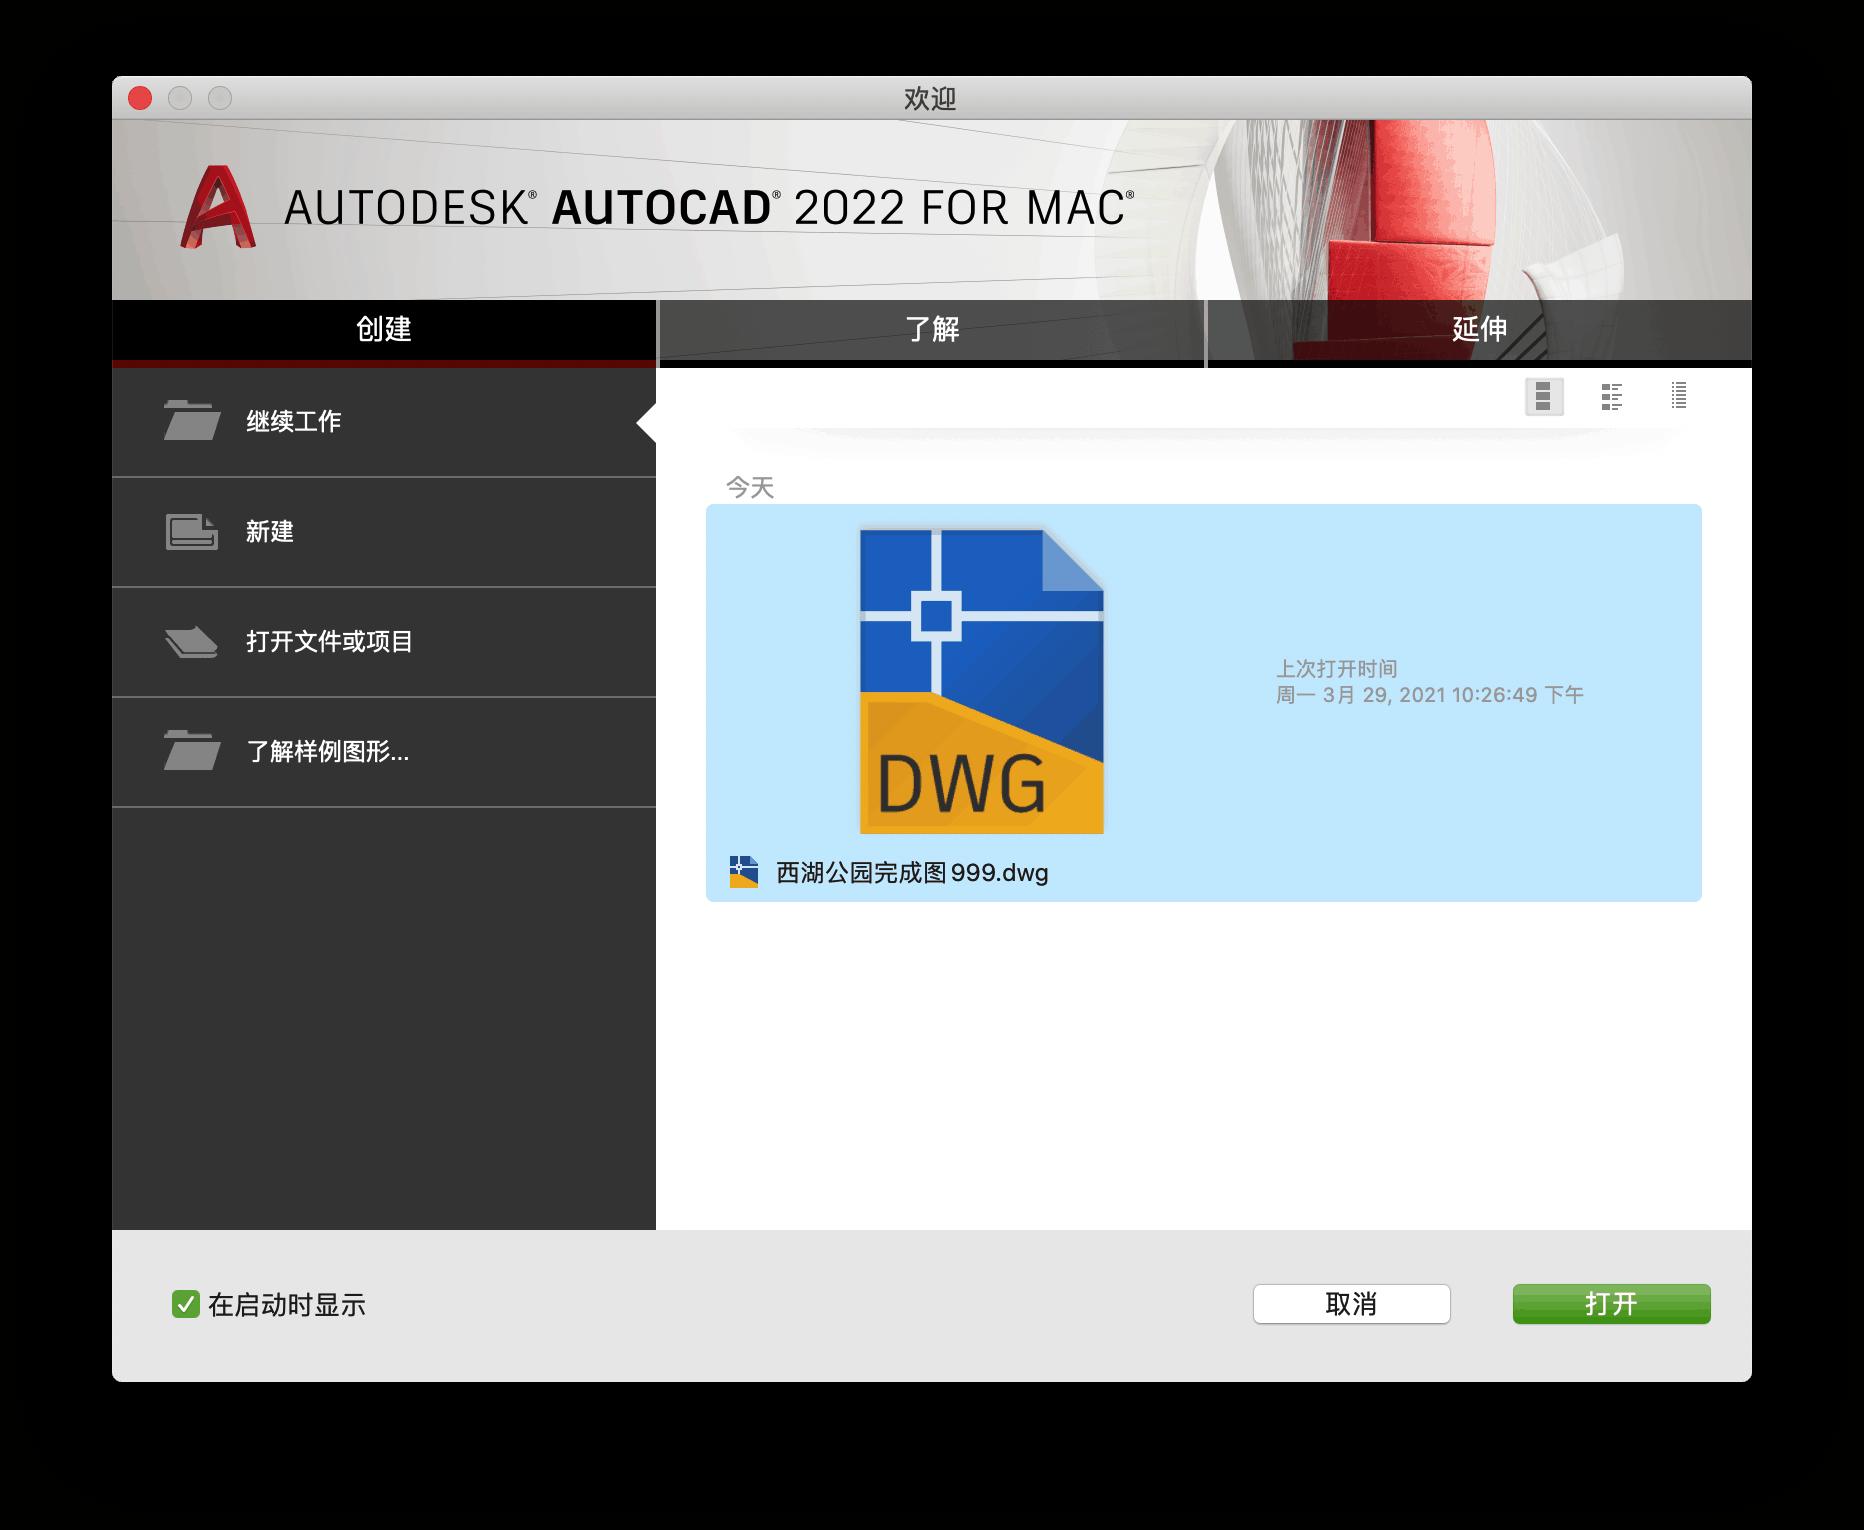 AutoCAD LT 2022.1  for Mac 中文破解版   三维制图软件  第2张